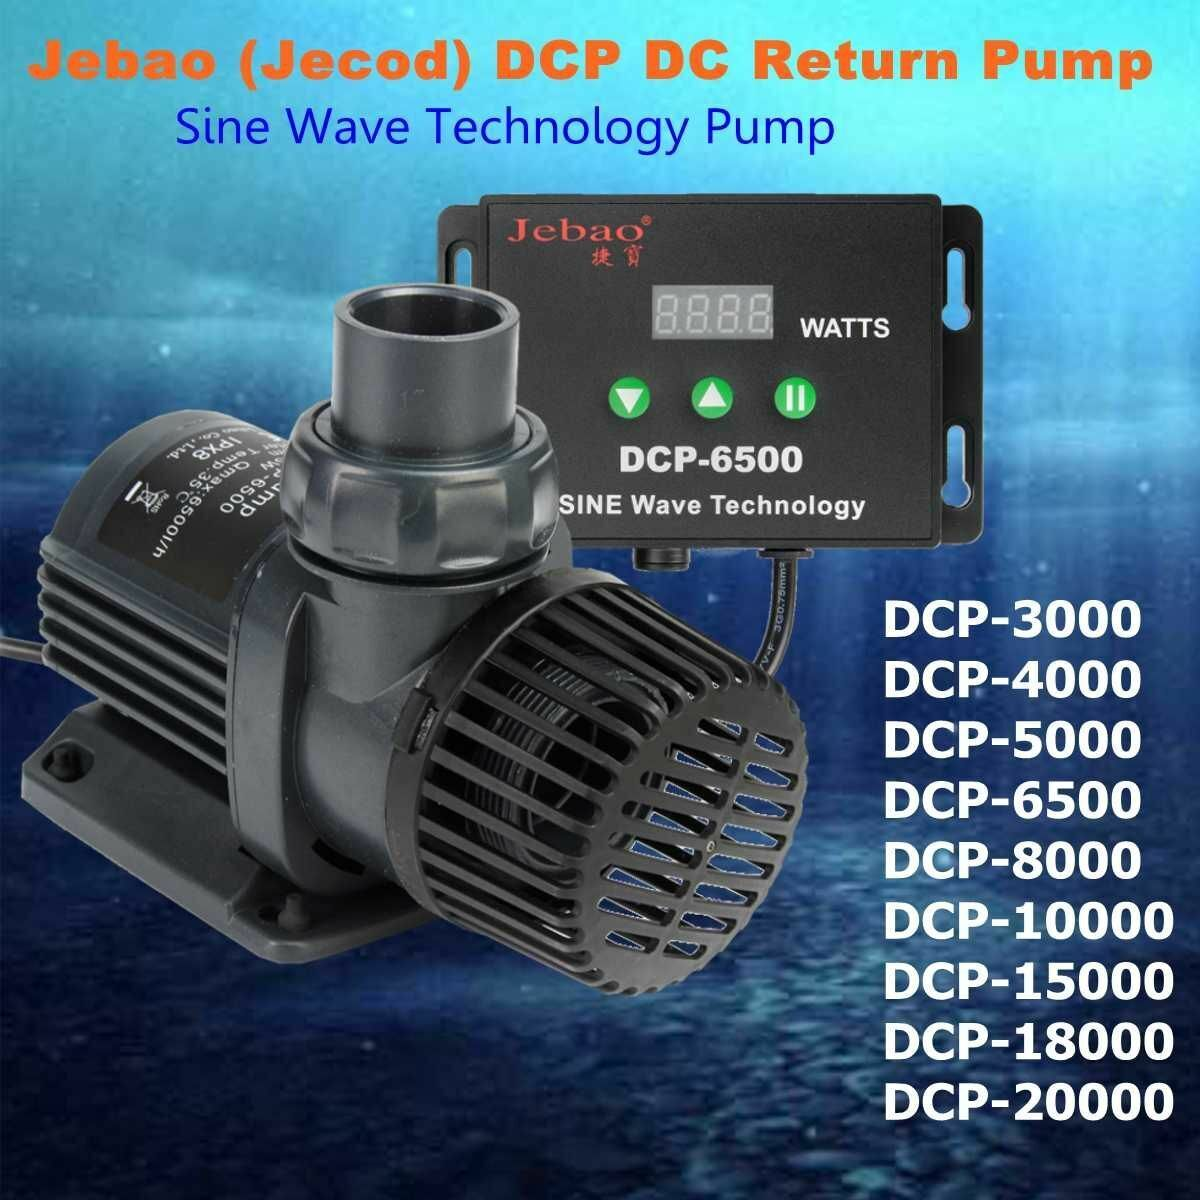 DCP Series 350020k Maring Flow Rate DC Sine Wave Return Submersible Water Pump